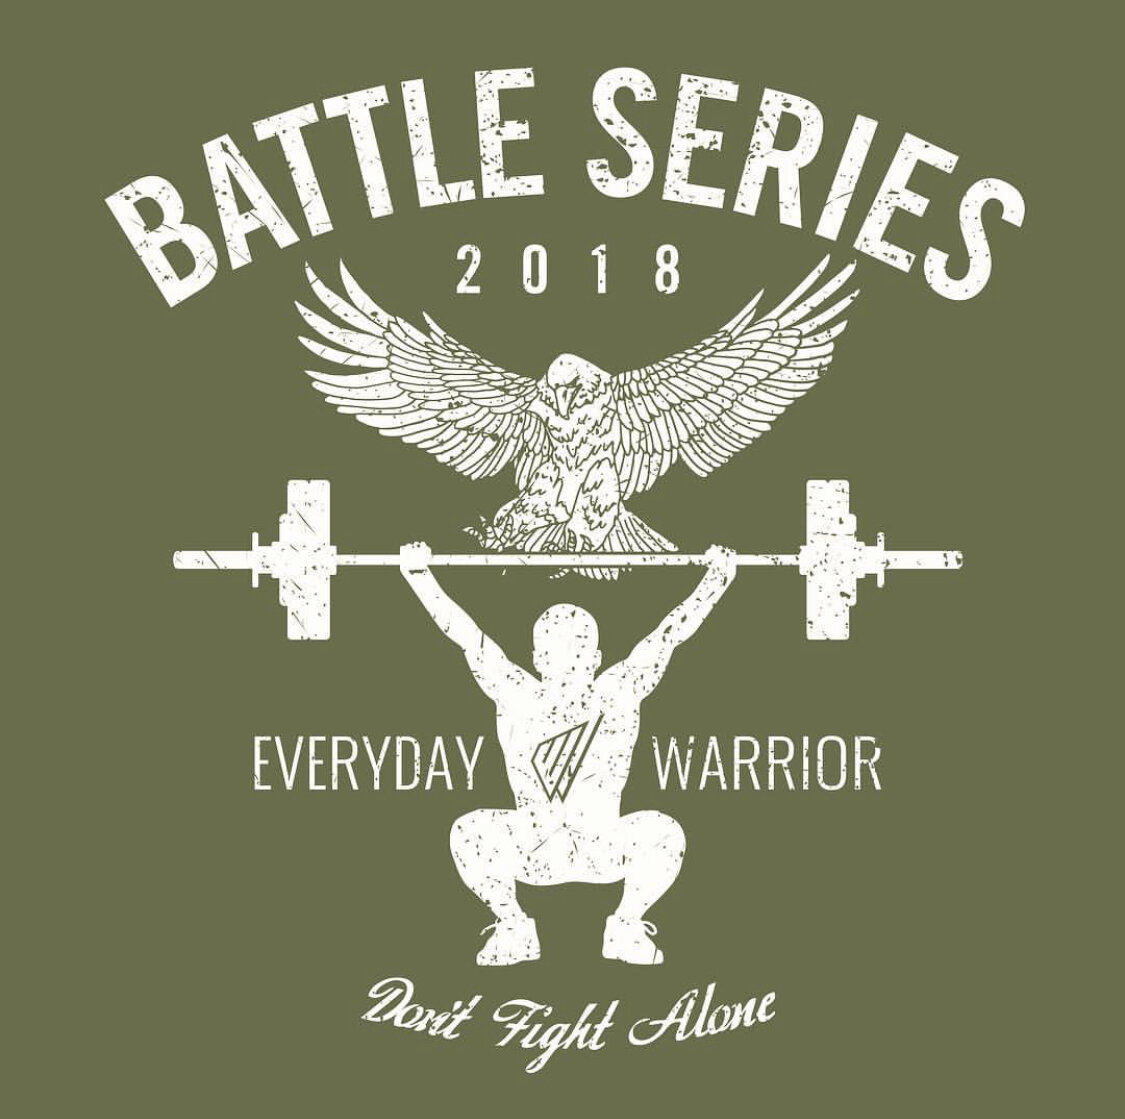 2018 Battle Series